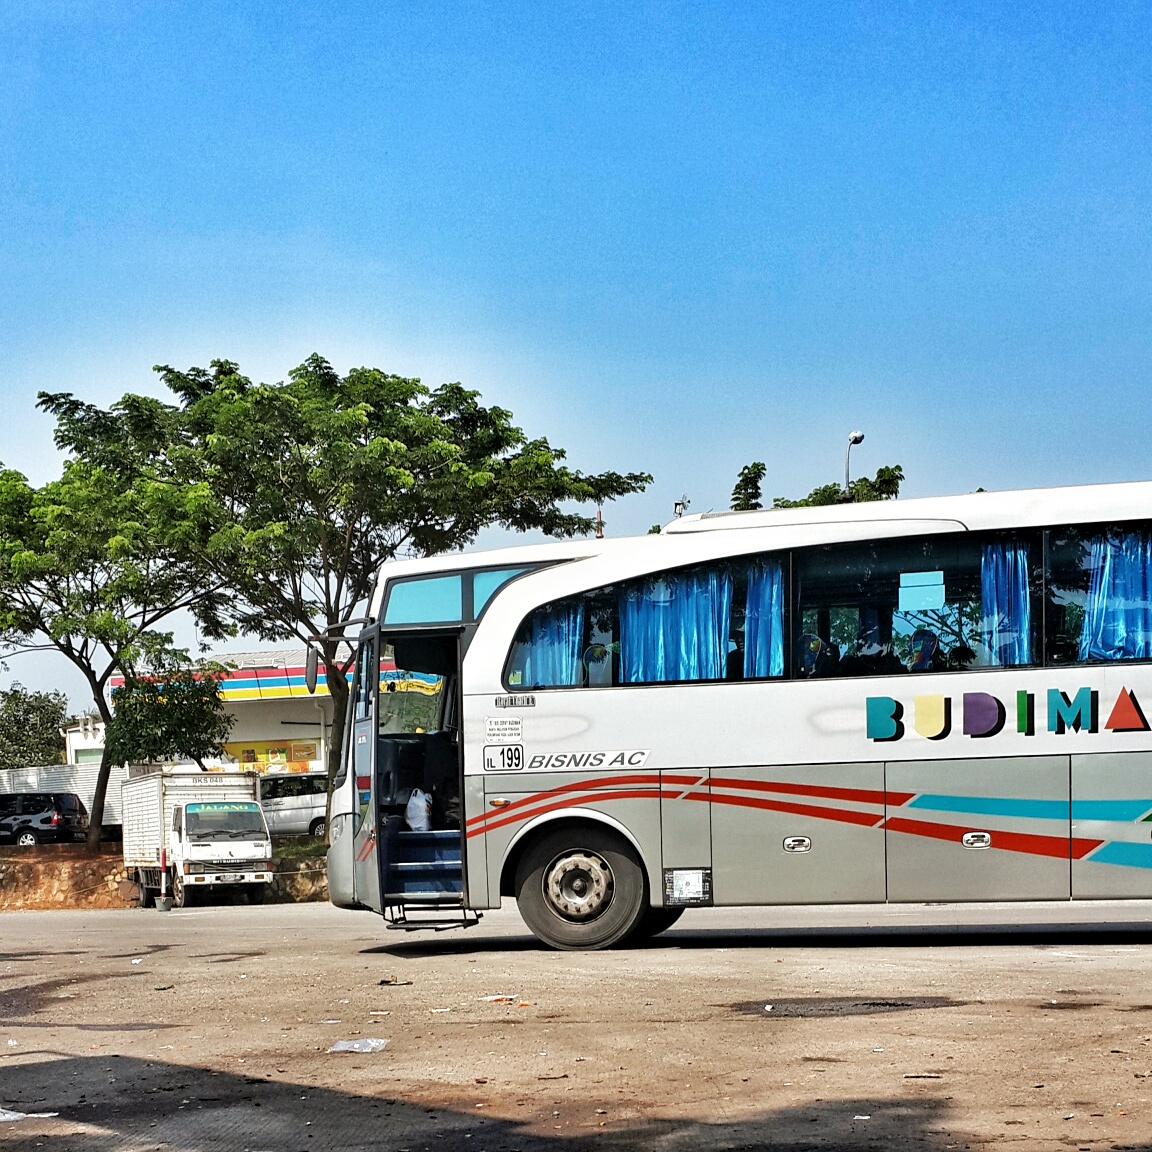 Travel Dari Bandung Ke Ciawi Bogor | lifehacked1st.com